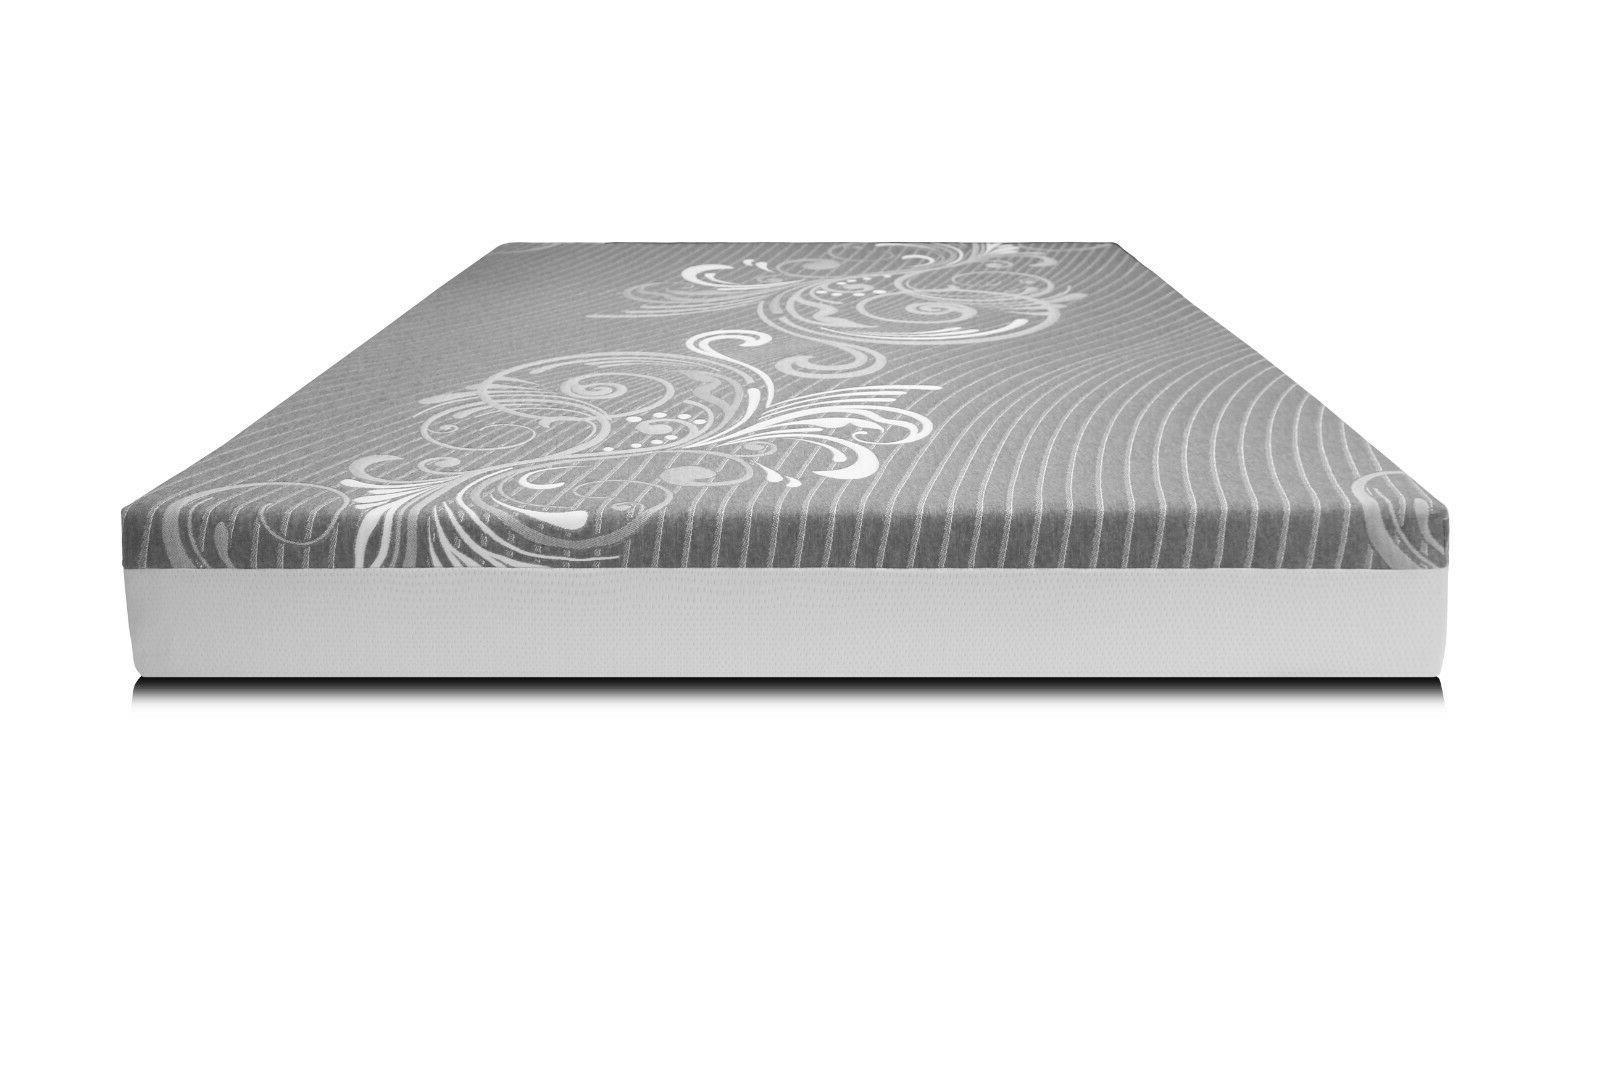 8 gel memory foam mattress king queen